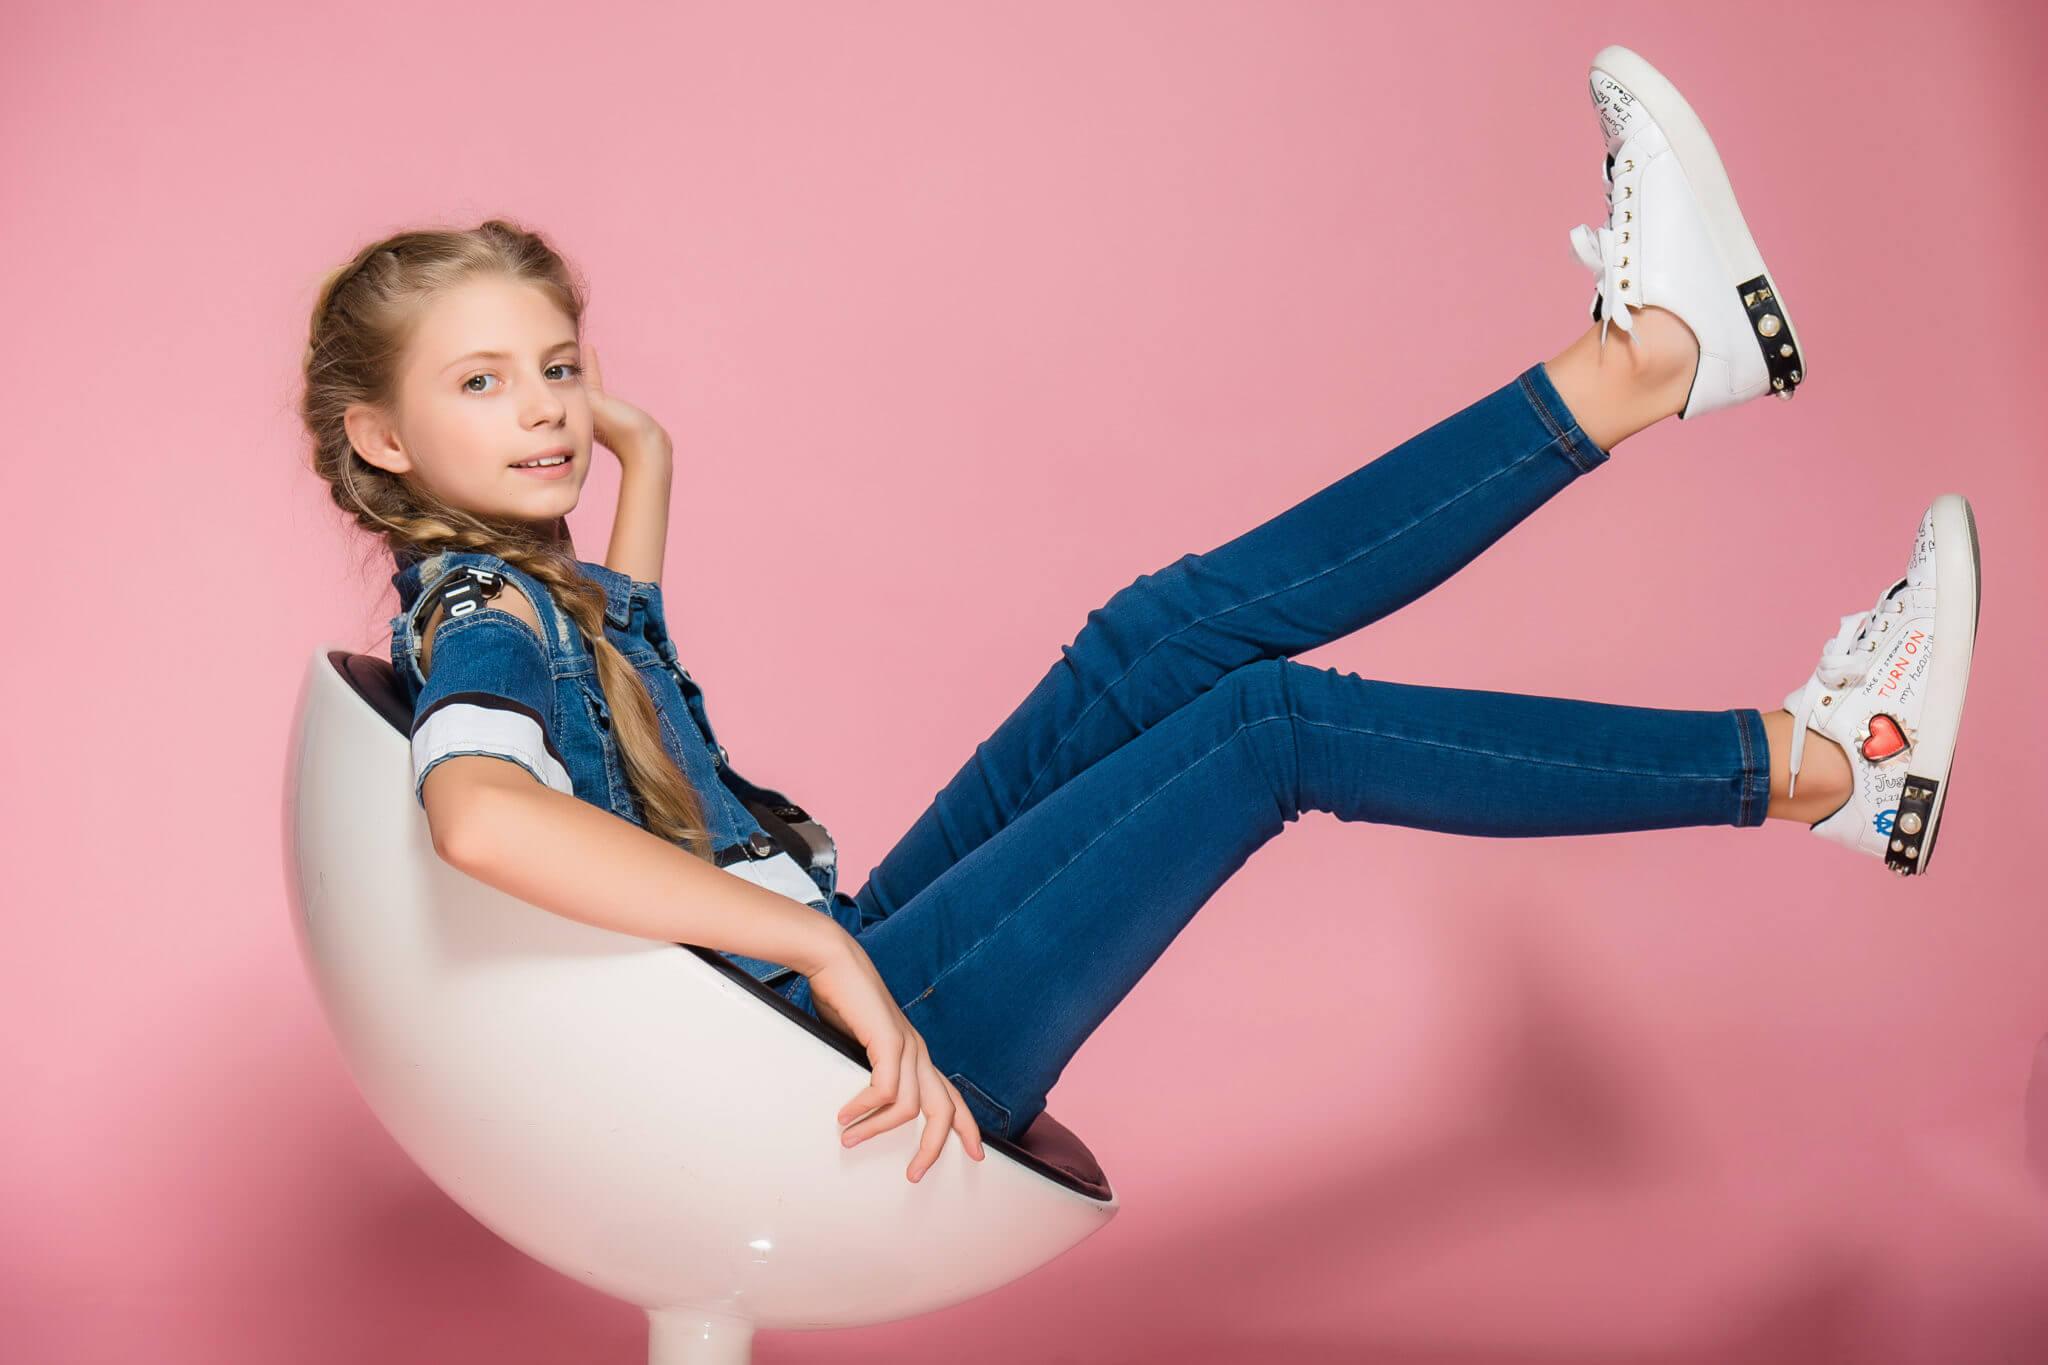 Детское портфолио, KidsTop100, фото Постникова А.